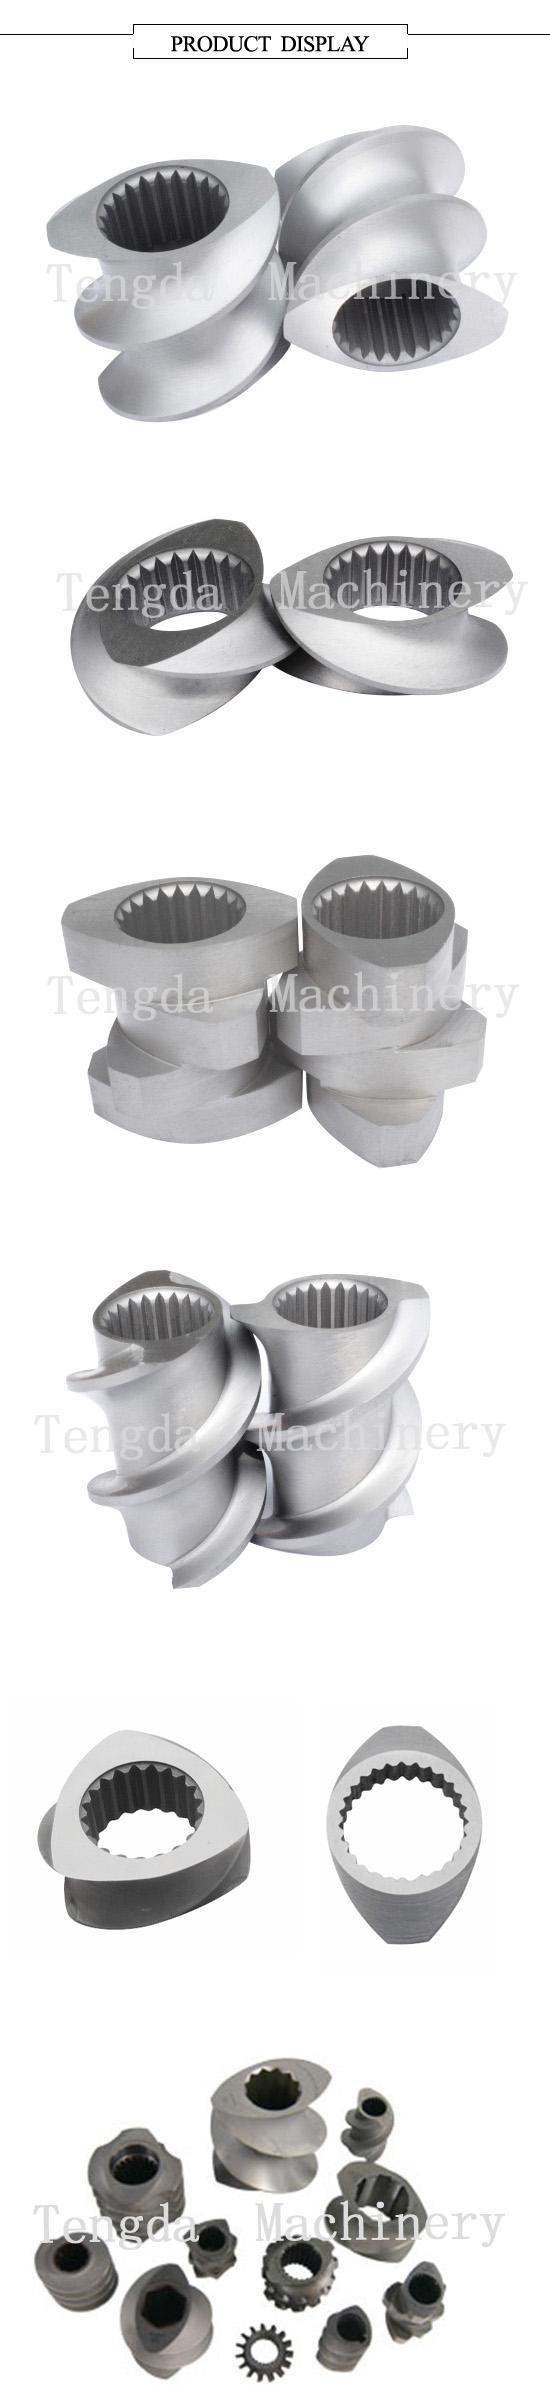 Precise Processed Screw Component for Tenda Plastic Machine